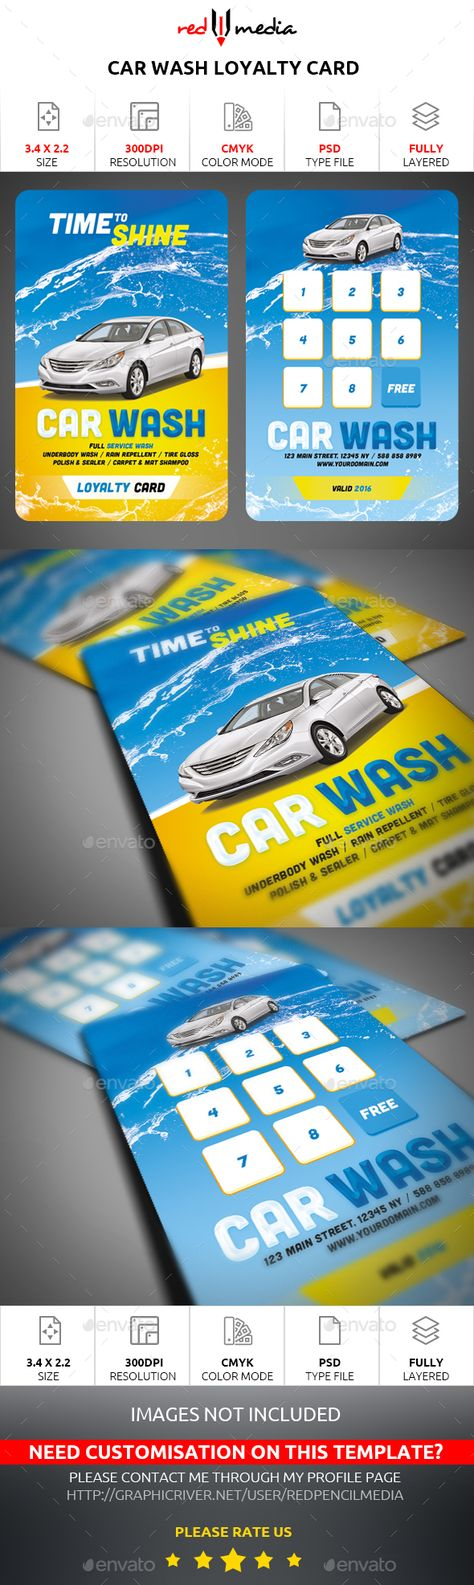 Car Wash Loyalty Card Car Wash Loyalty Card Template Car Wash Business